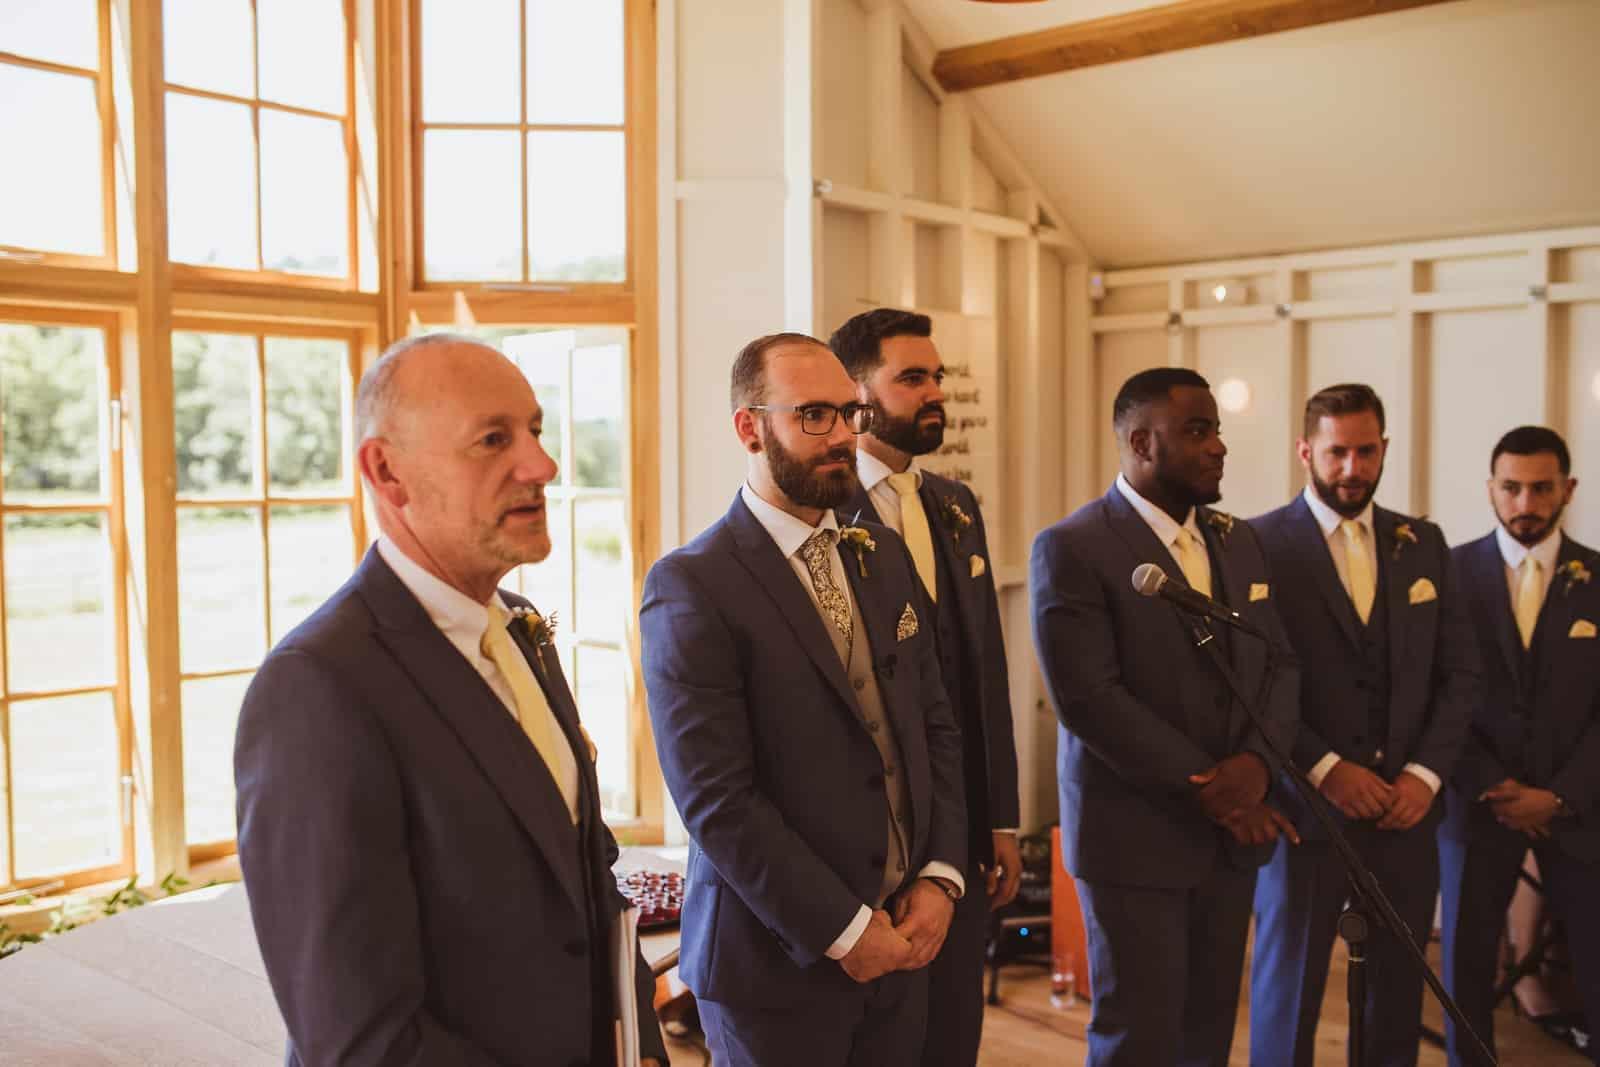 Cotswolds Wedding Photographer 0059